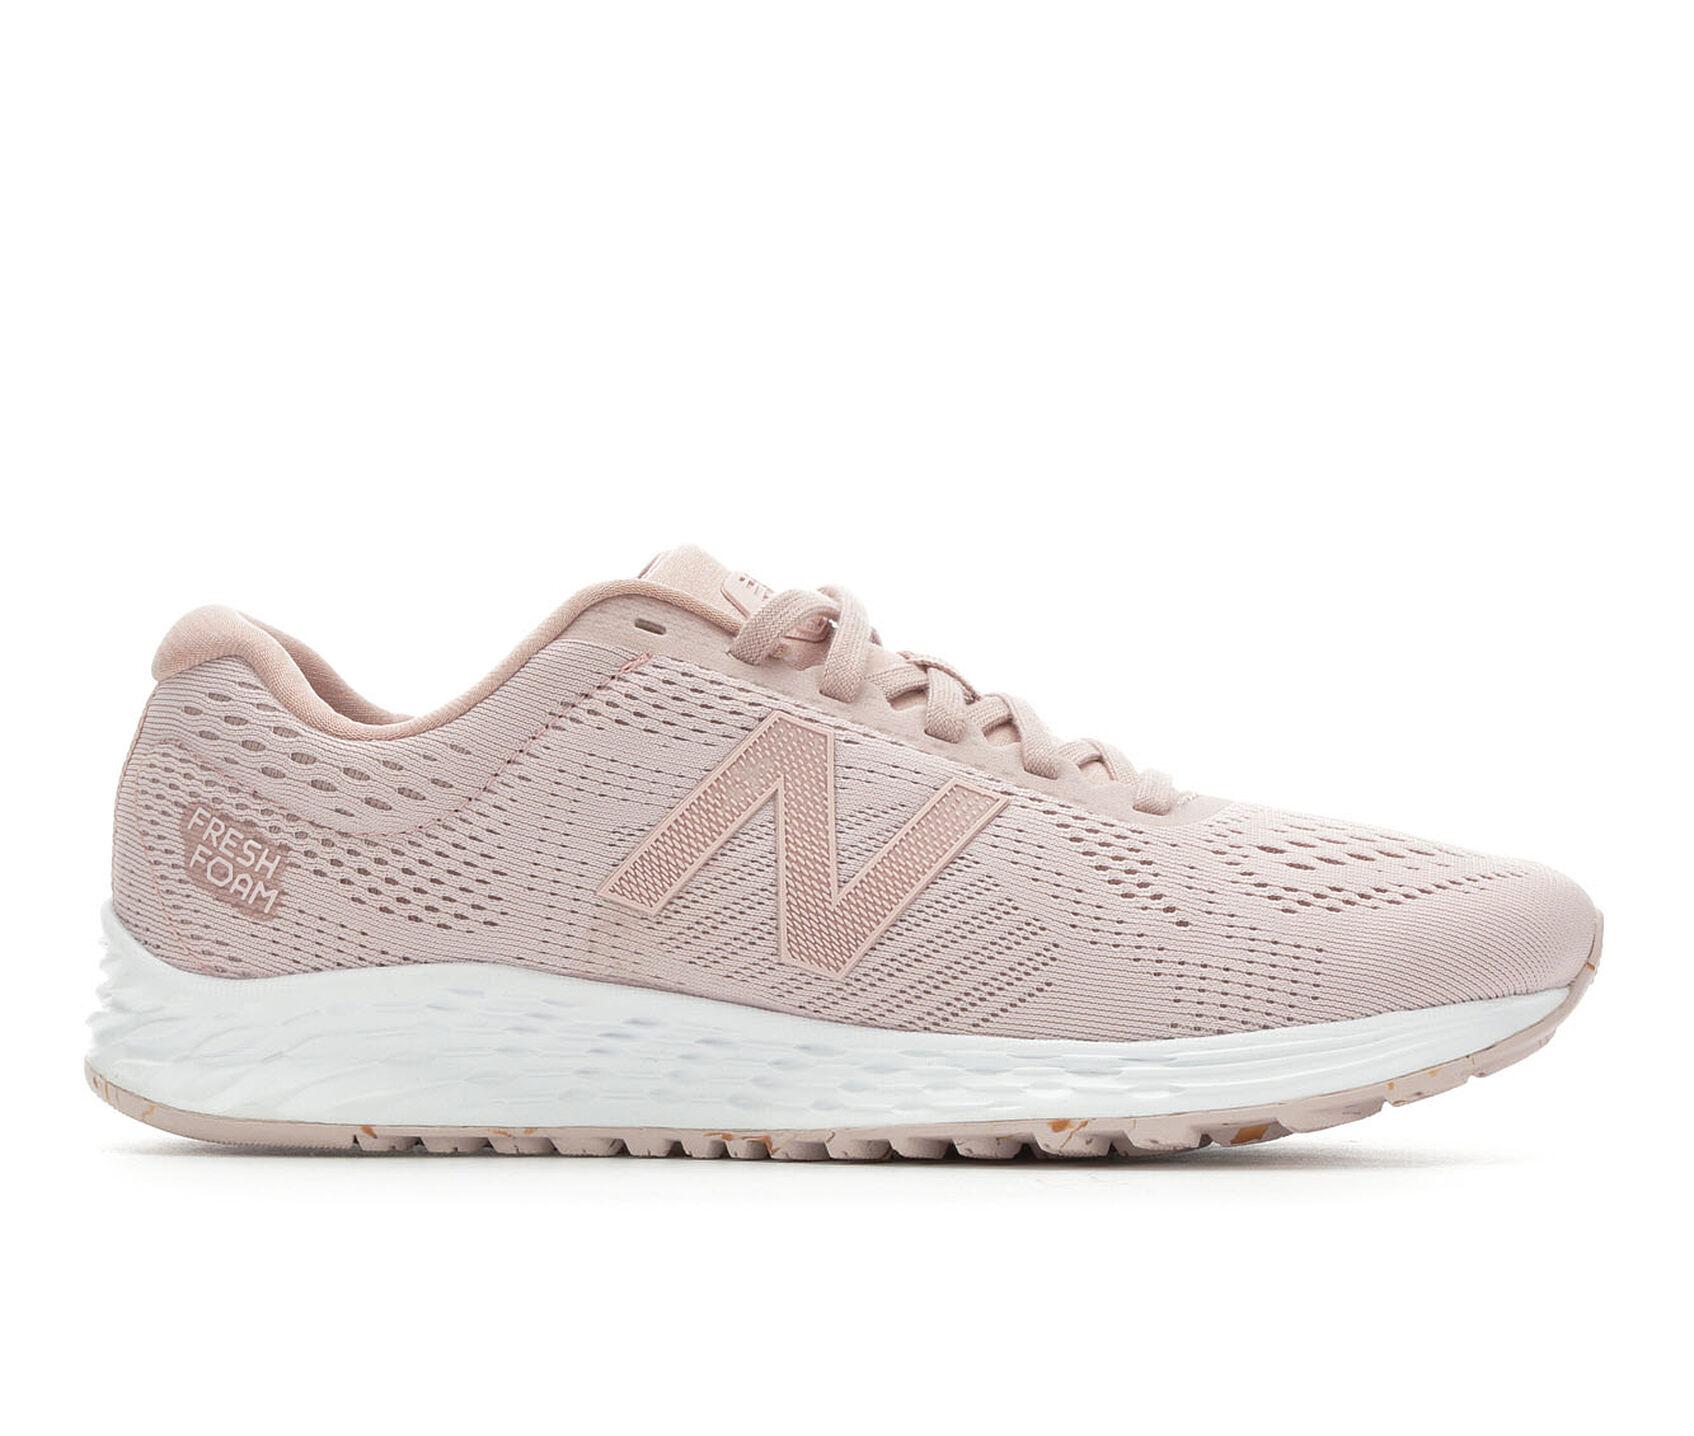 61975c66edc9 Women s New Balance Arishi Running Shoes